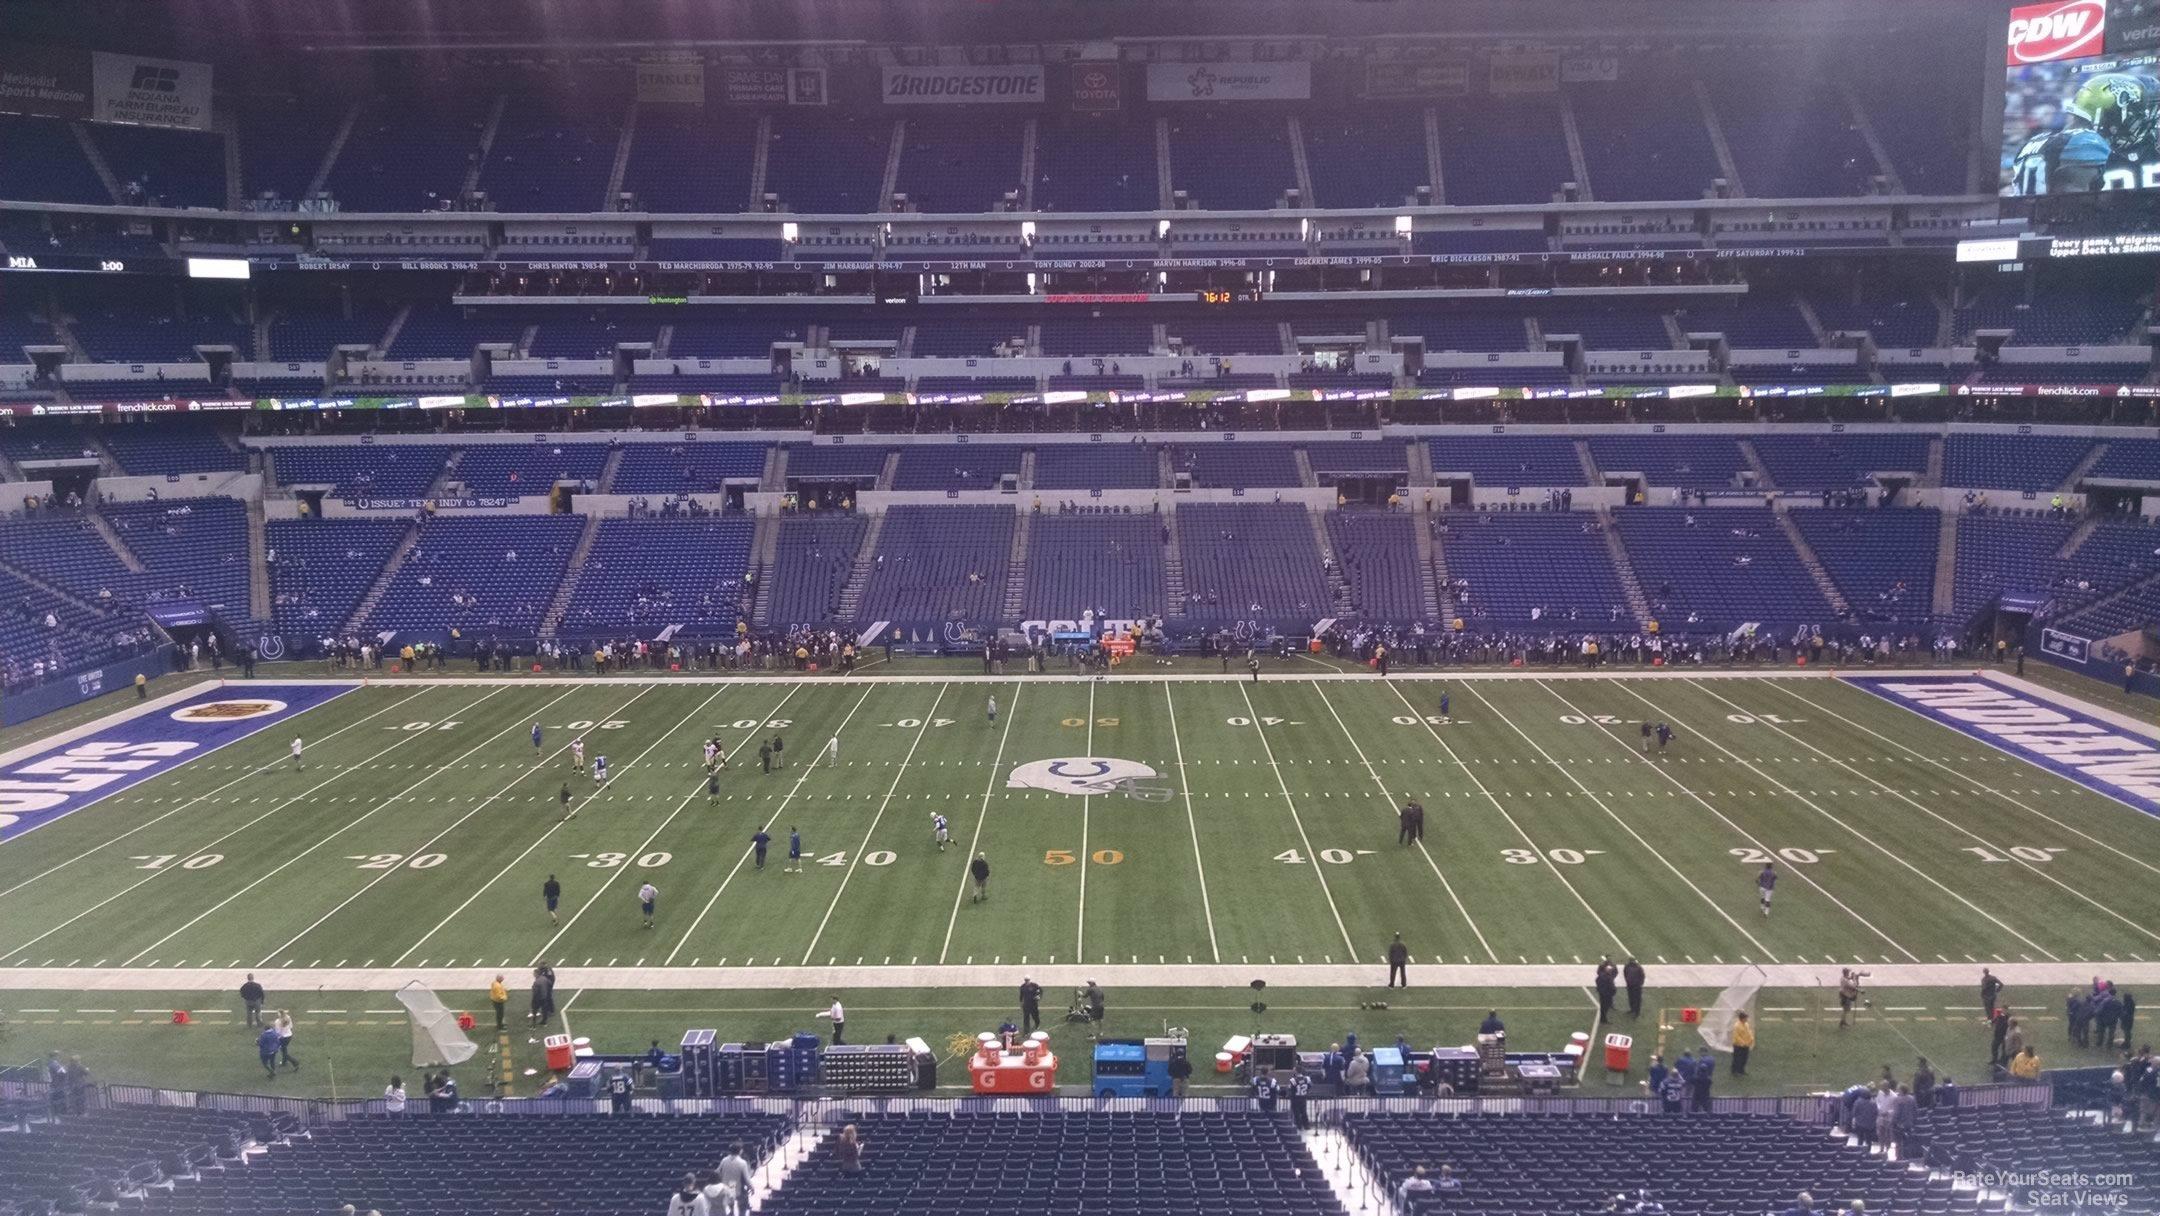 Lucas Oil Stadium Seating Chart Rows Big Ten Football